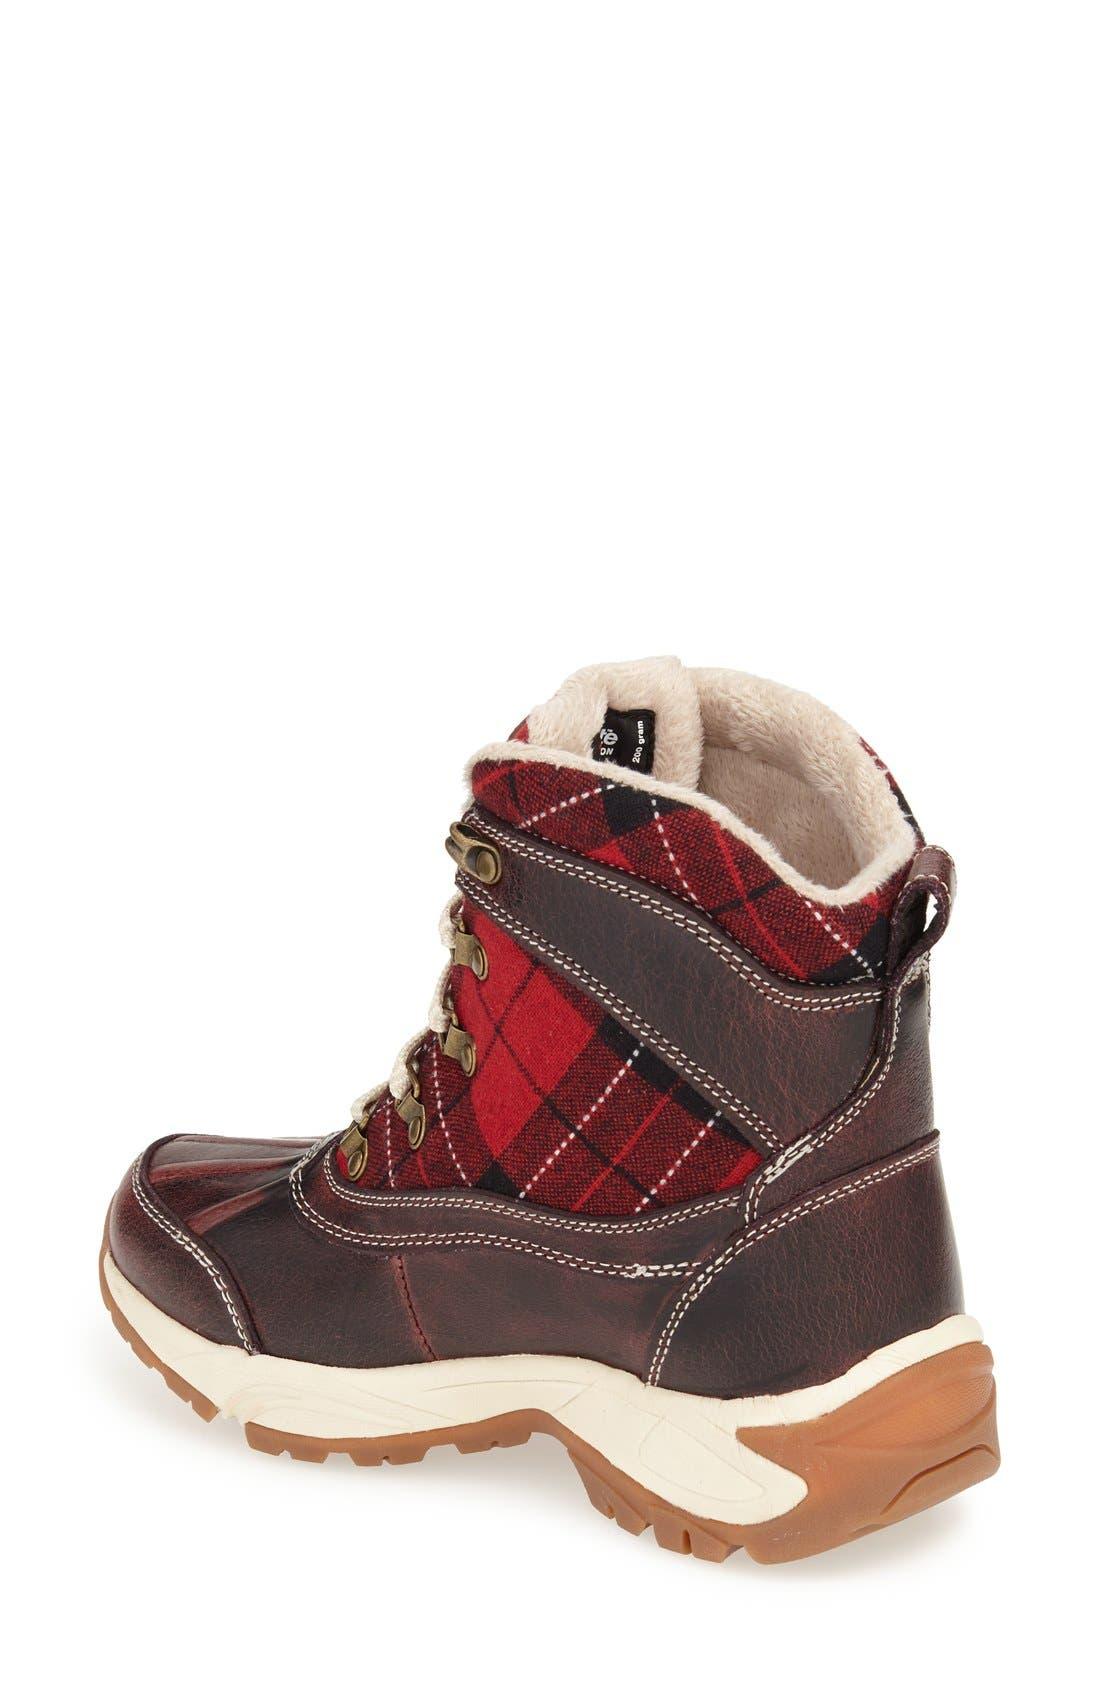 Alternate Image 2  - Kodiak 'Rochelle' Waterproof Insulated Winter Boot (Women)